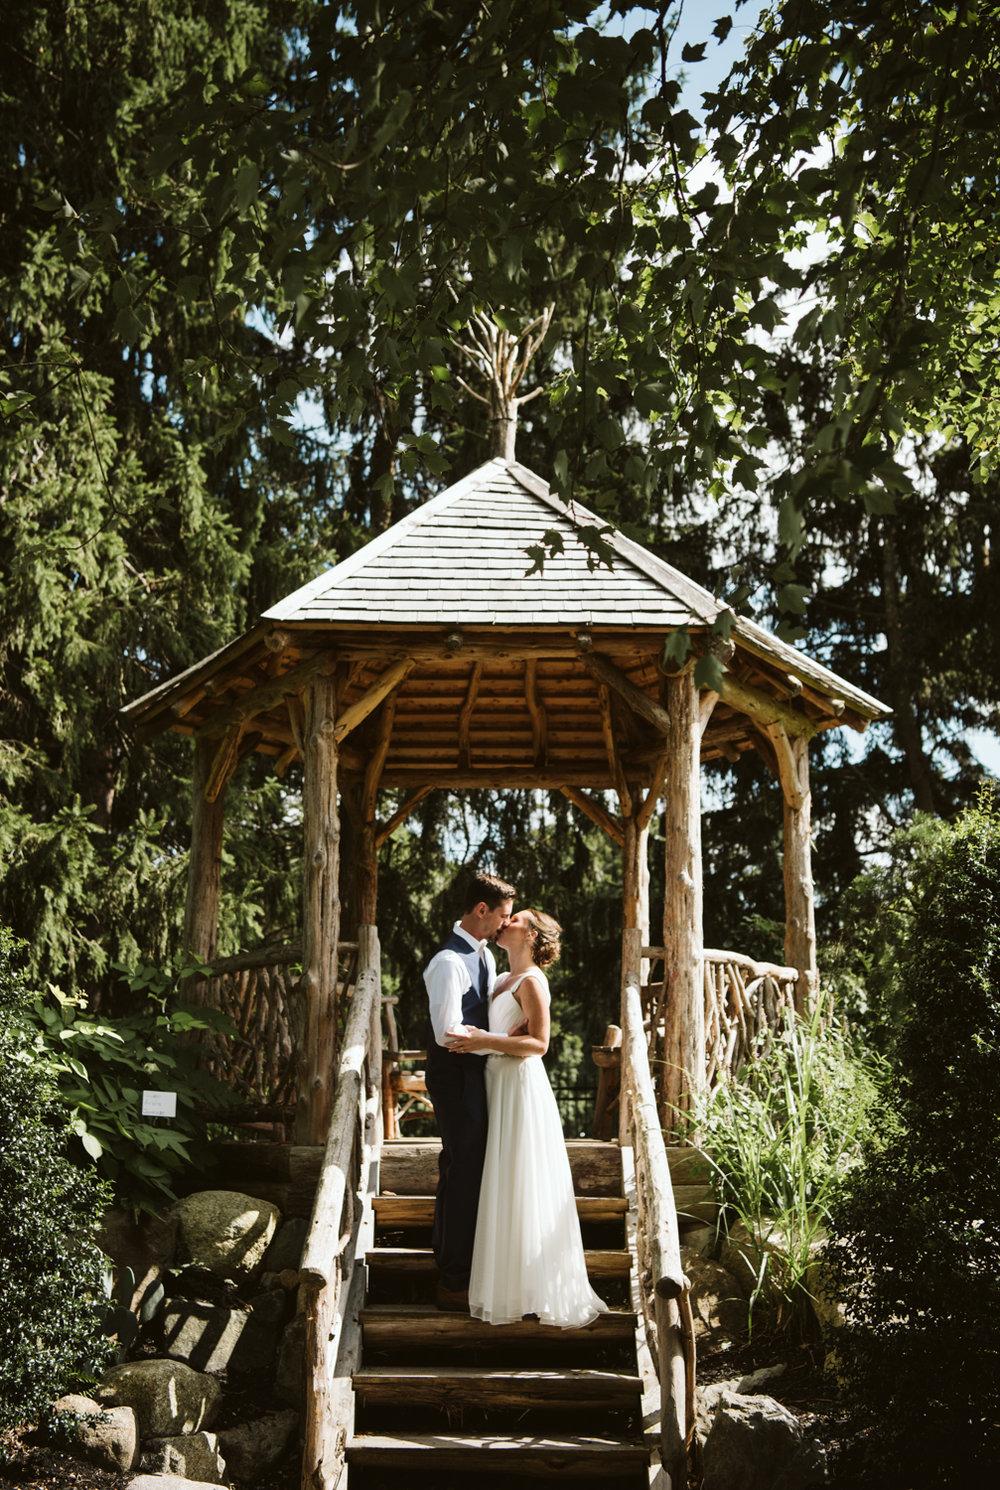 emily_alex_elm_bank_wedding_wellesley_DSC_1521.jpg